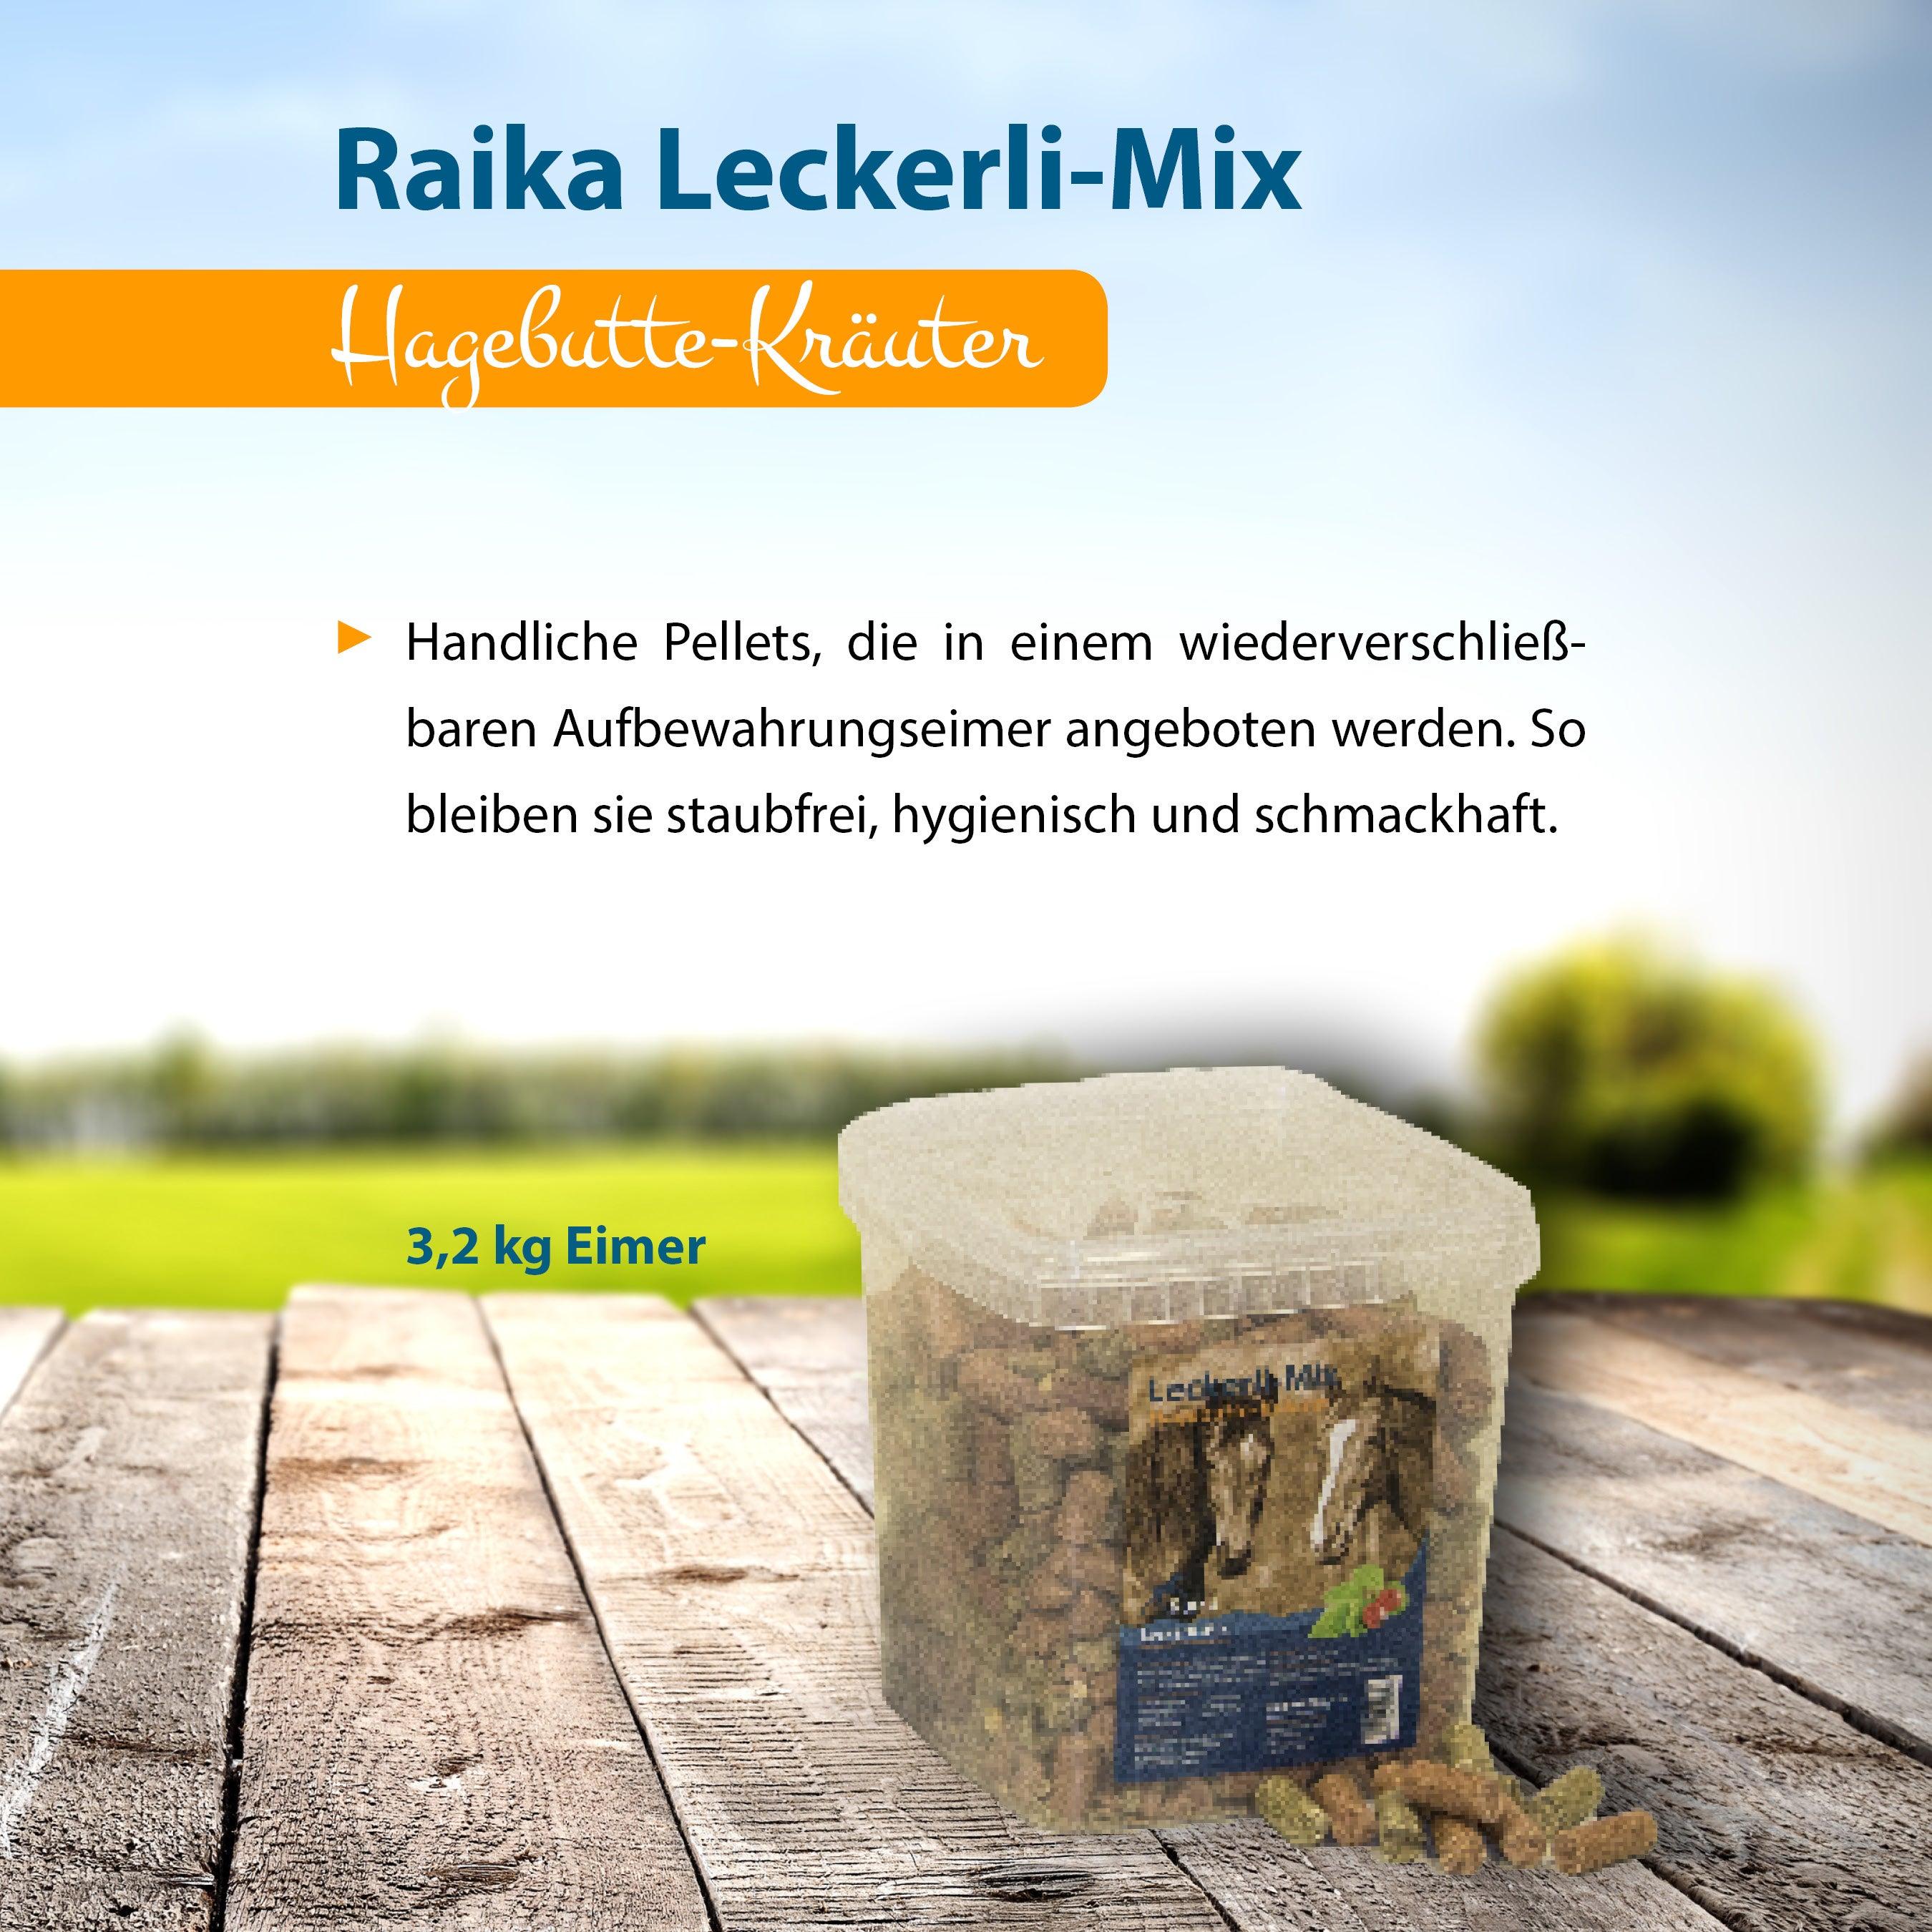 Raika Leckerli-Mix Hagebutte-Kräuter Pferdefutter